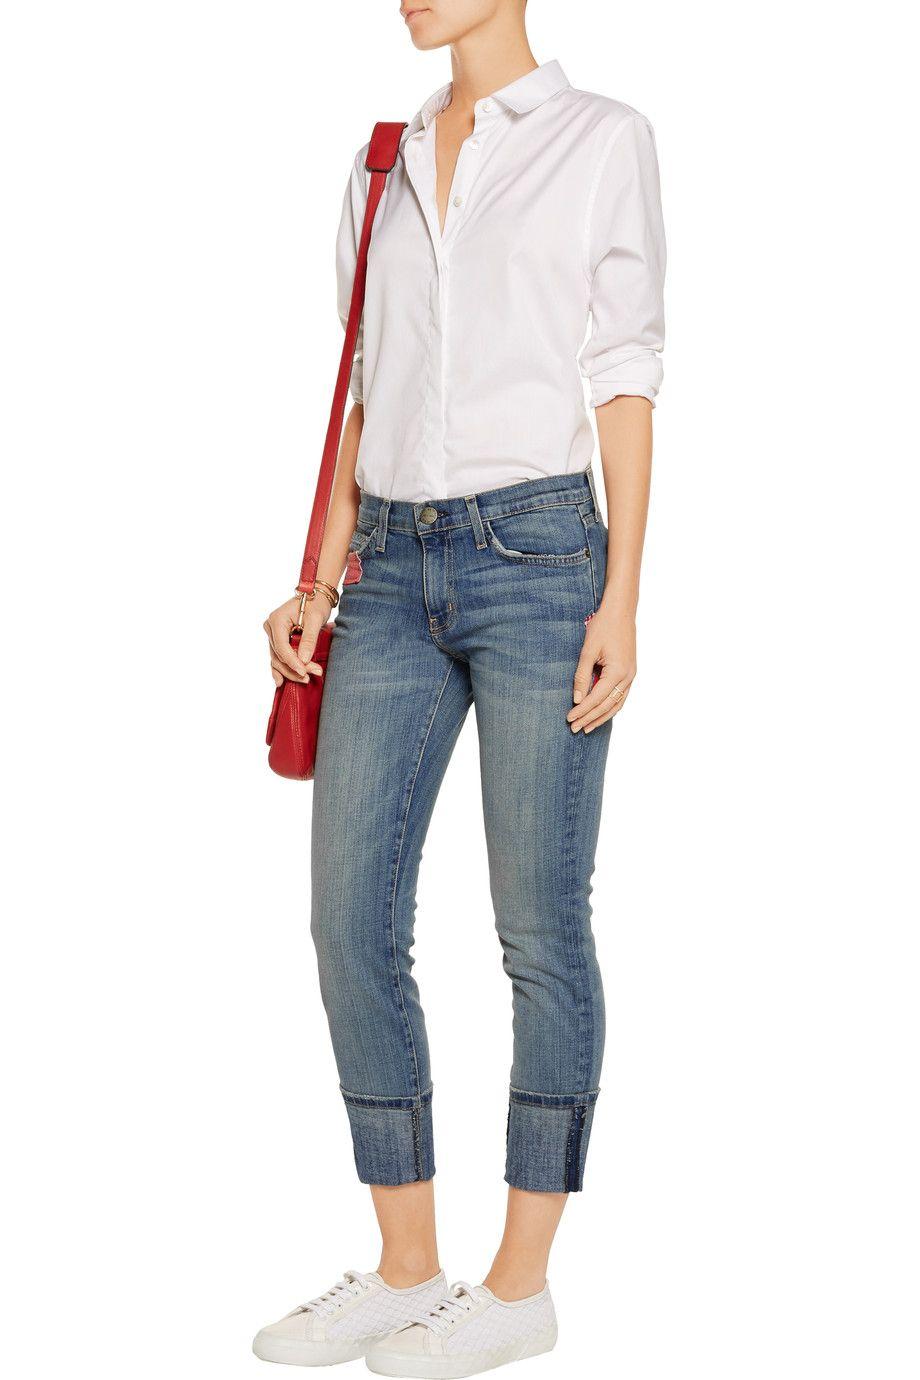 Current/ElliottThe Beatnik patchwork mid-rise skinny jeansfront